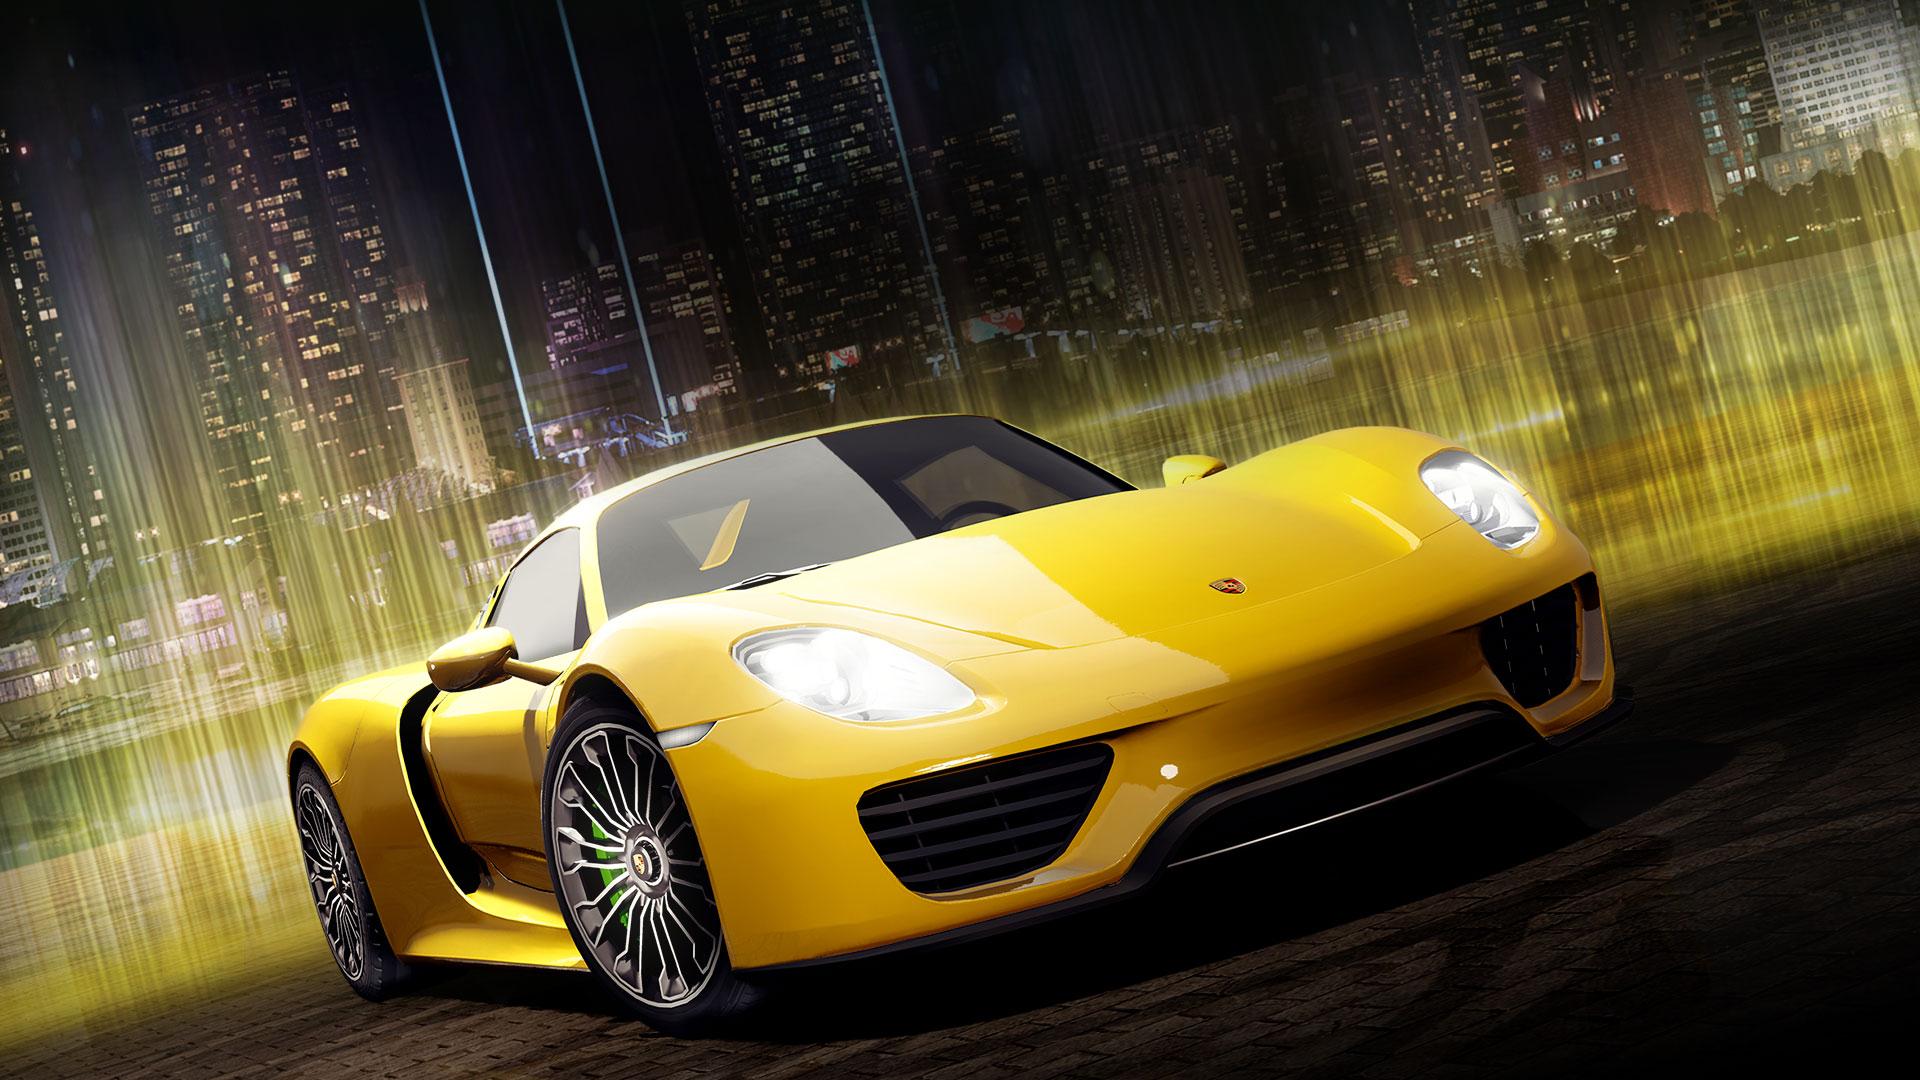 Front view of yellow Porsche Carrera